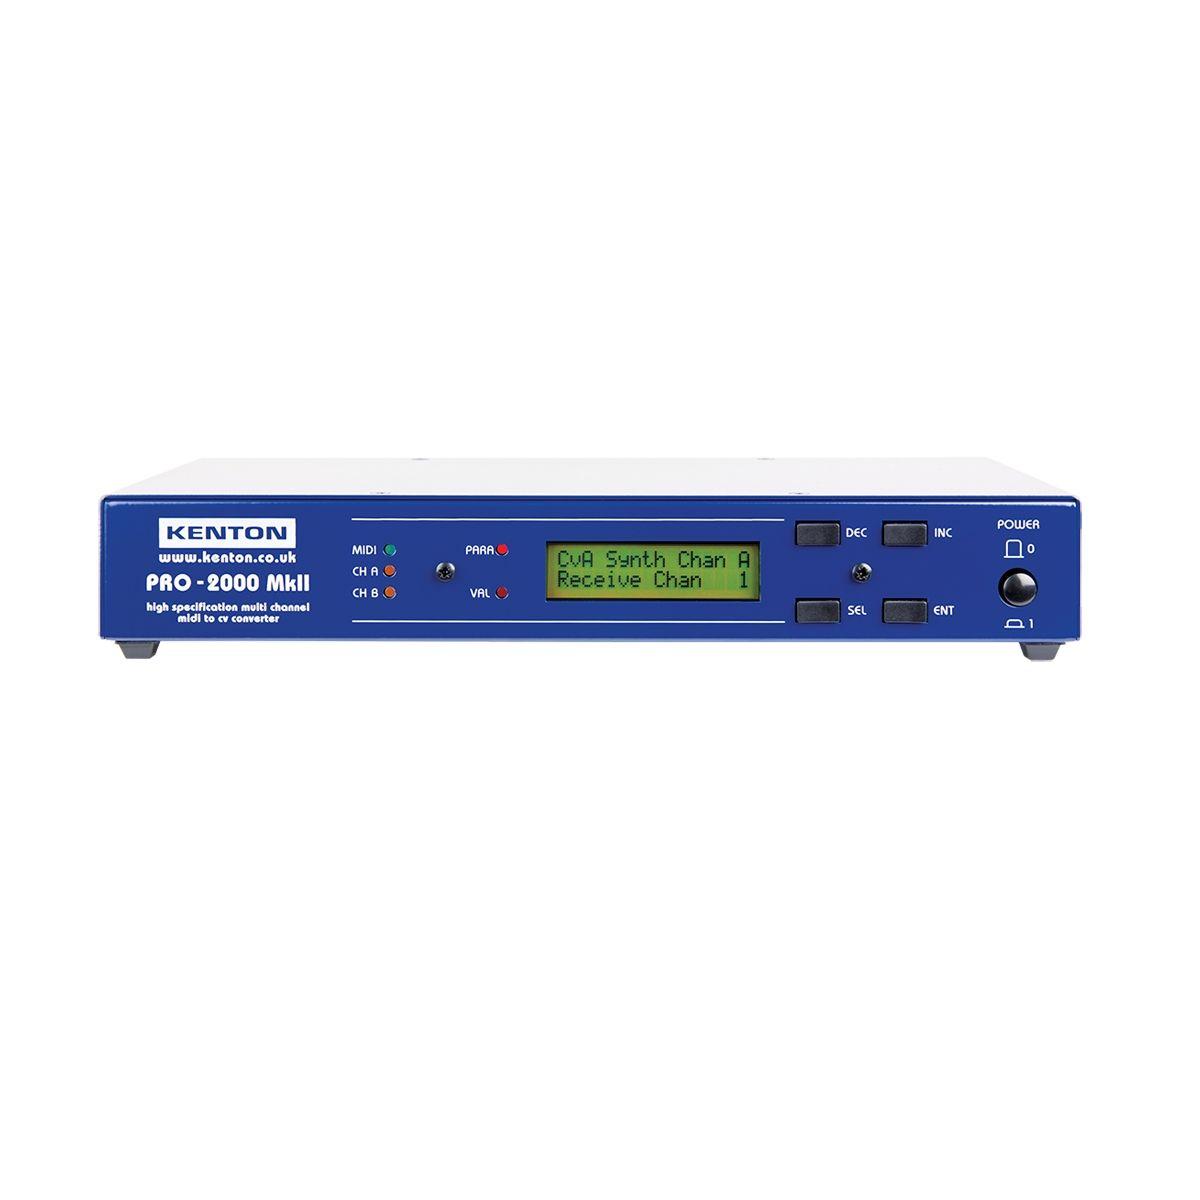 Kenton ElectronicsPro 2000 MKII MIDI to CV/Gate Convertor